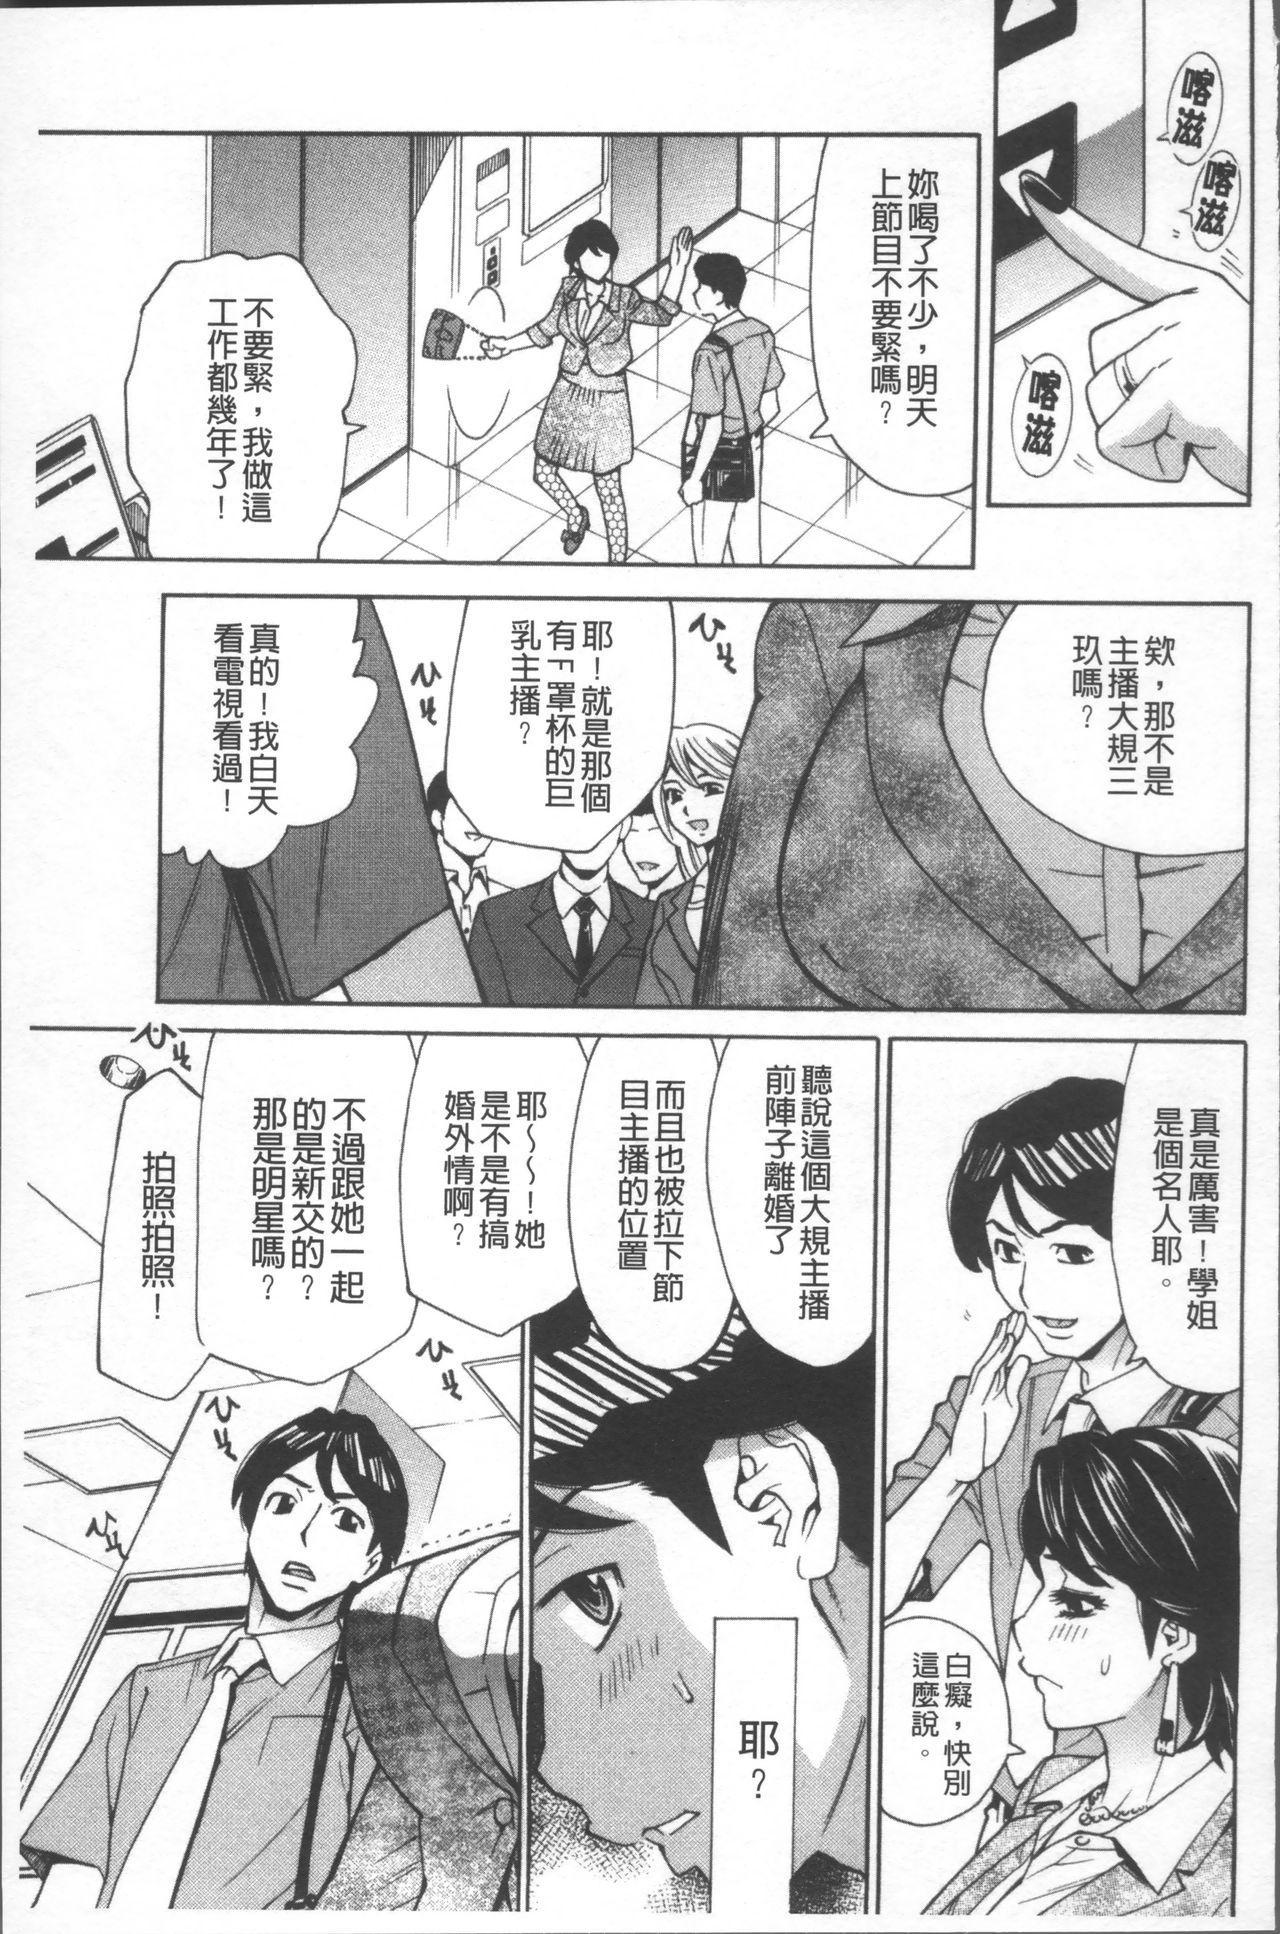 Hitozuma Kanshasai - SUPER EROTIC WIFE'S FESTIVAL 102